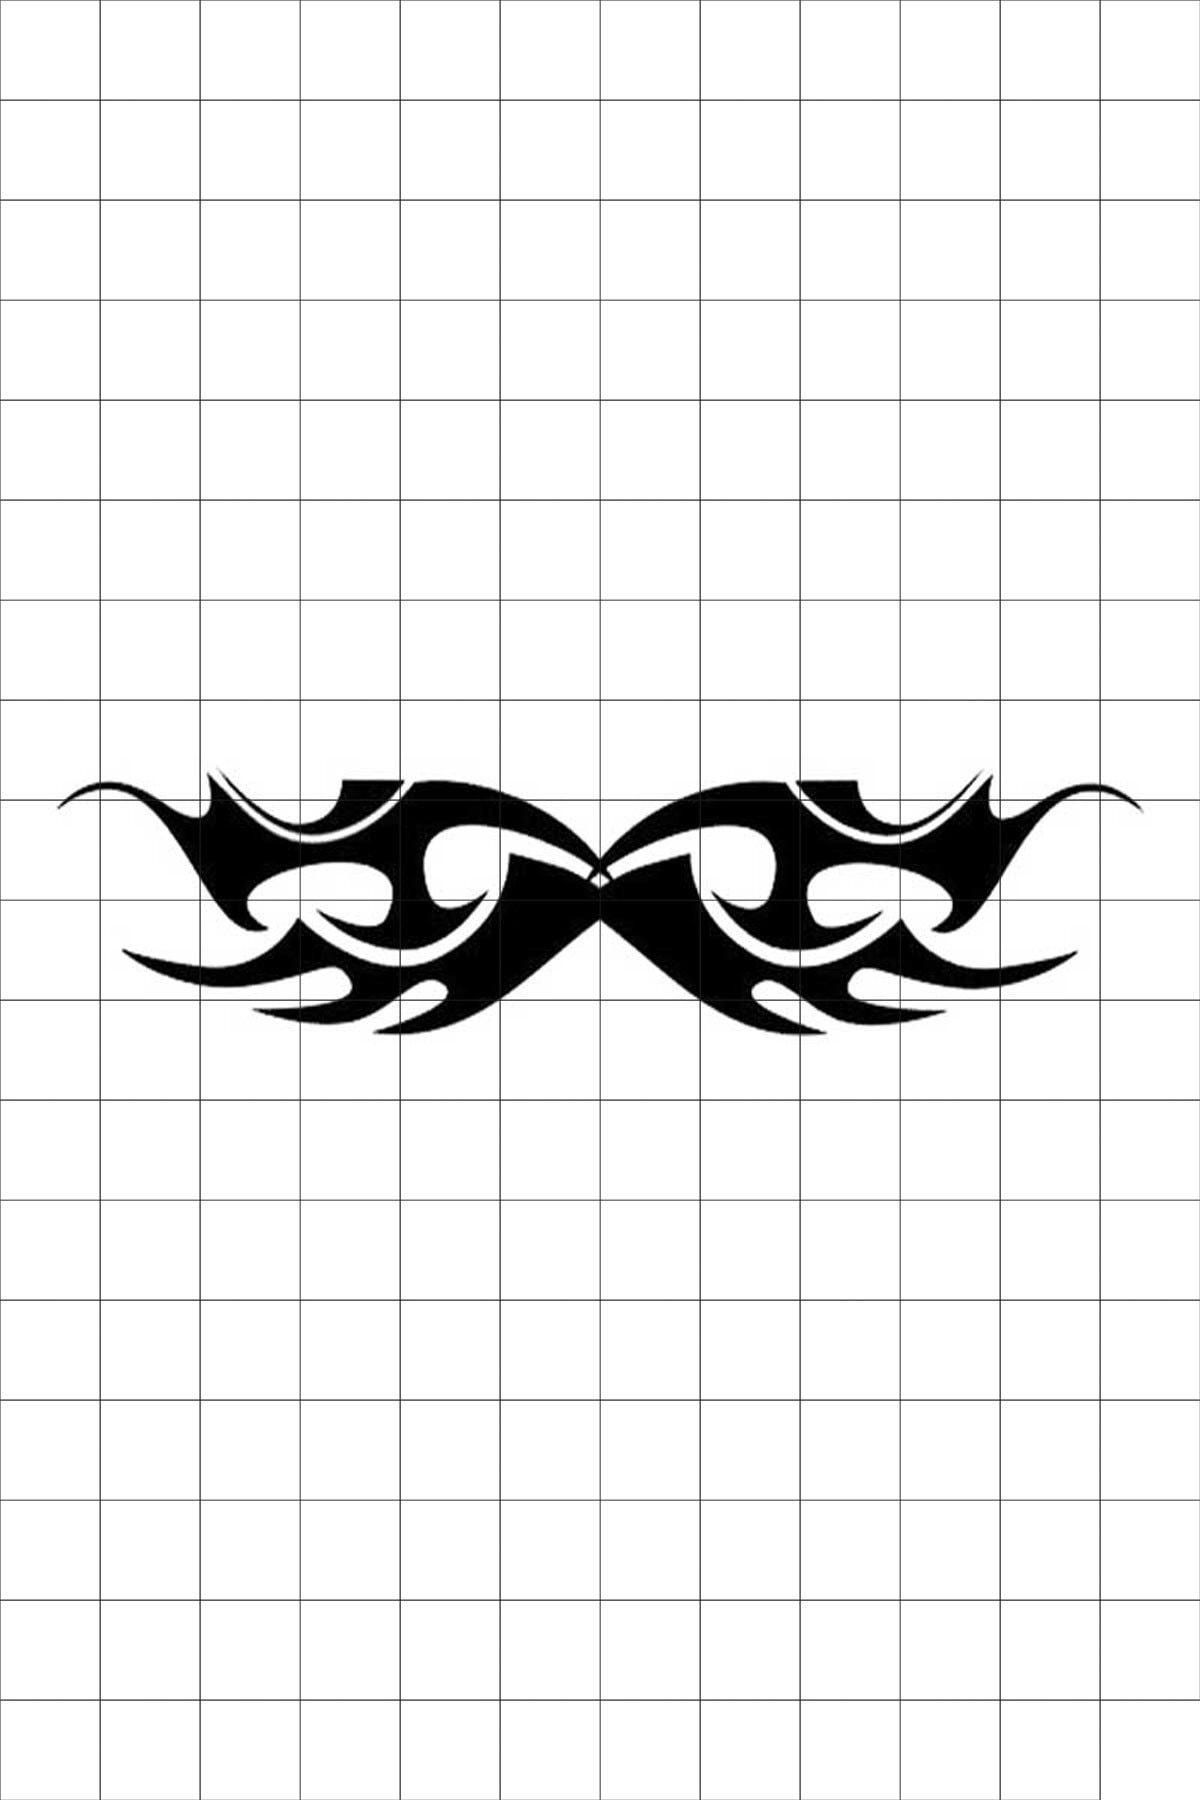 TatFast Kanat 1186 Geçici Dövme Flash Tattoo 0